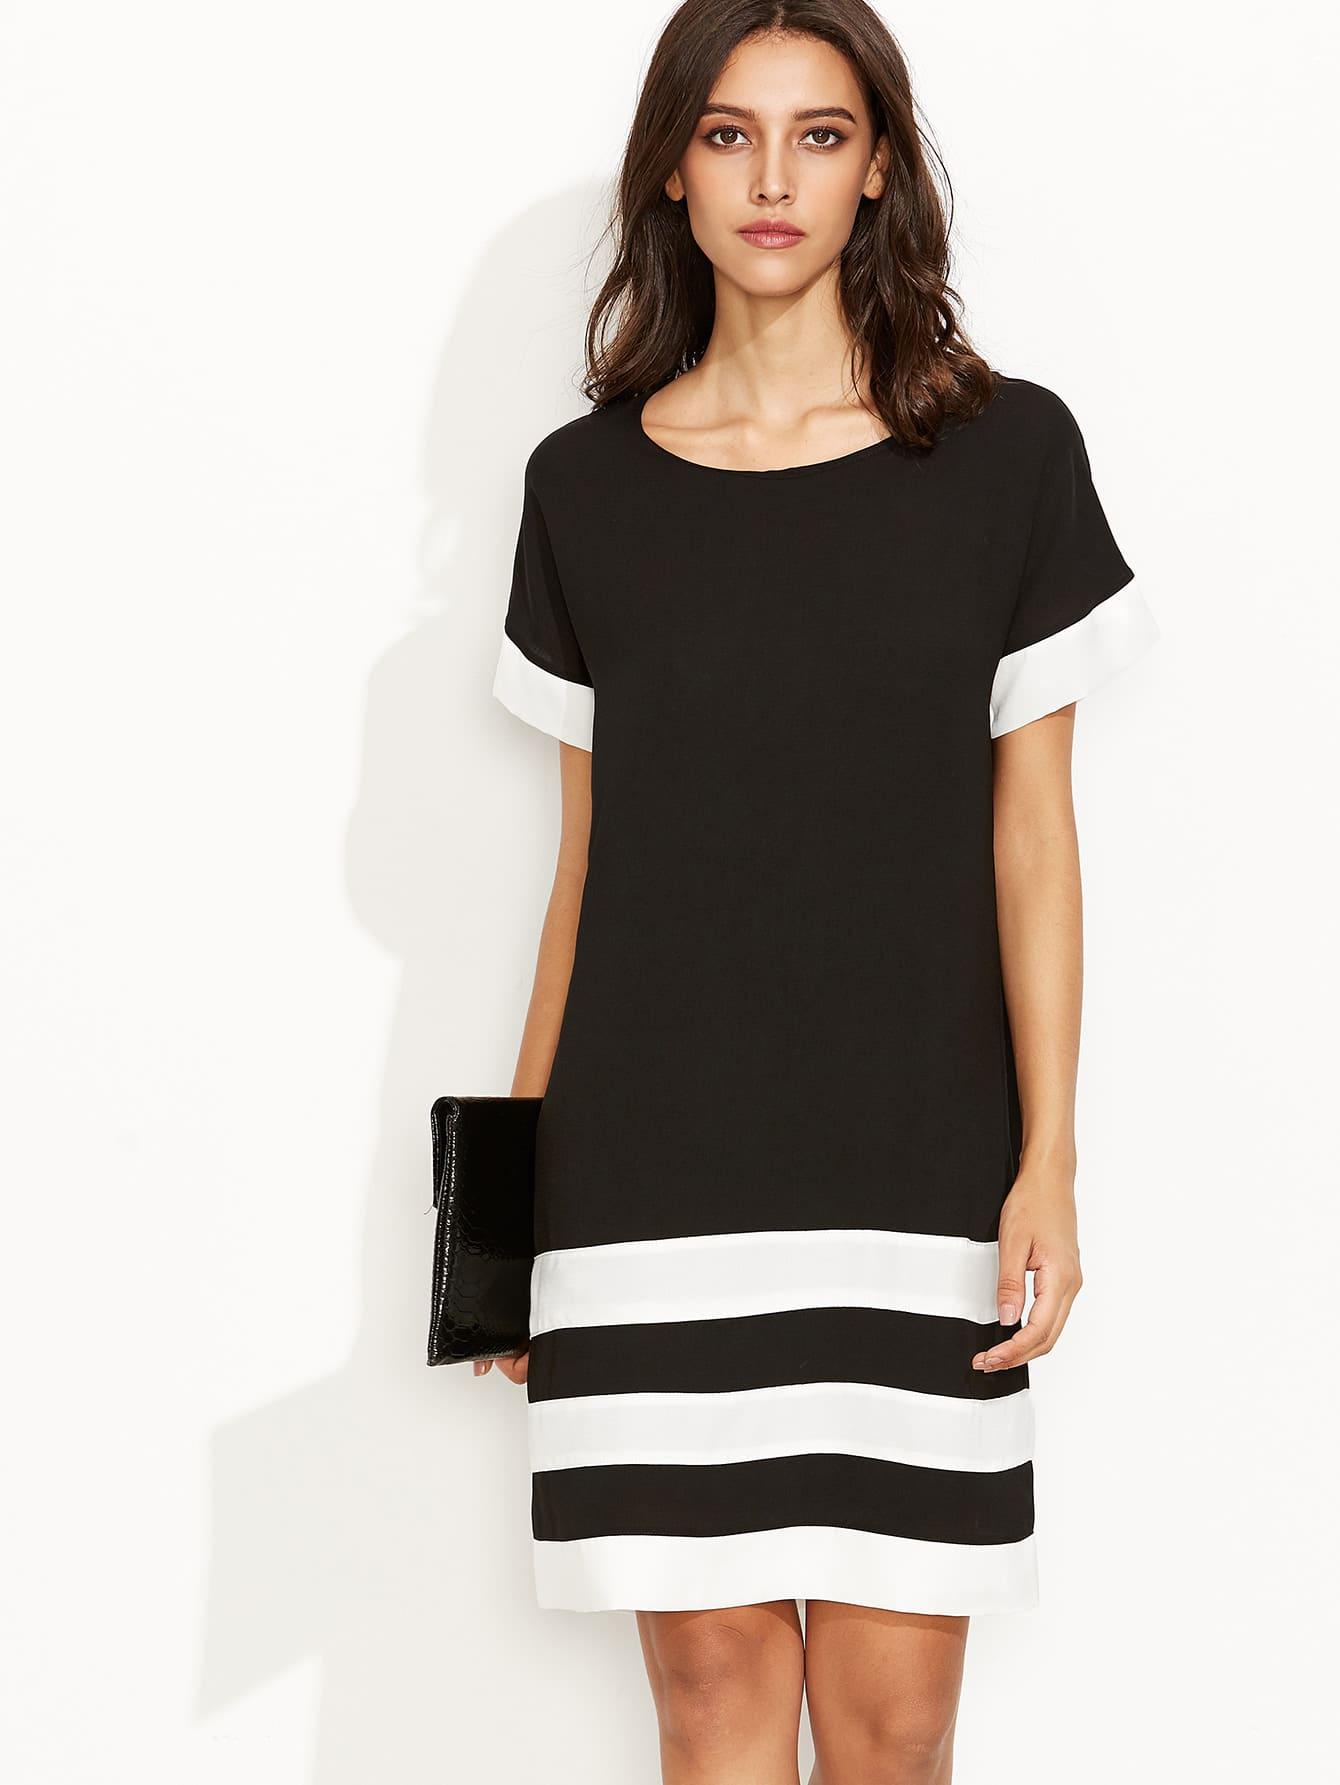 Black Contrast Panel Shift Dress